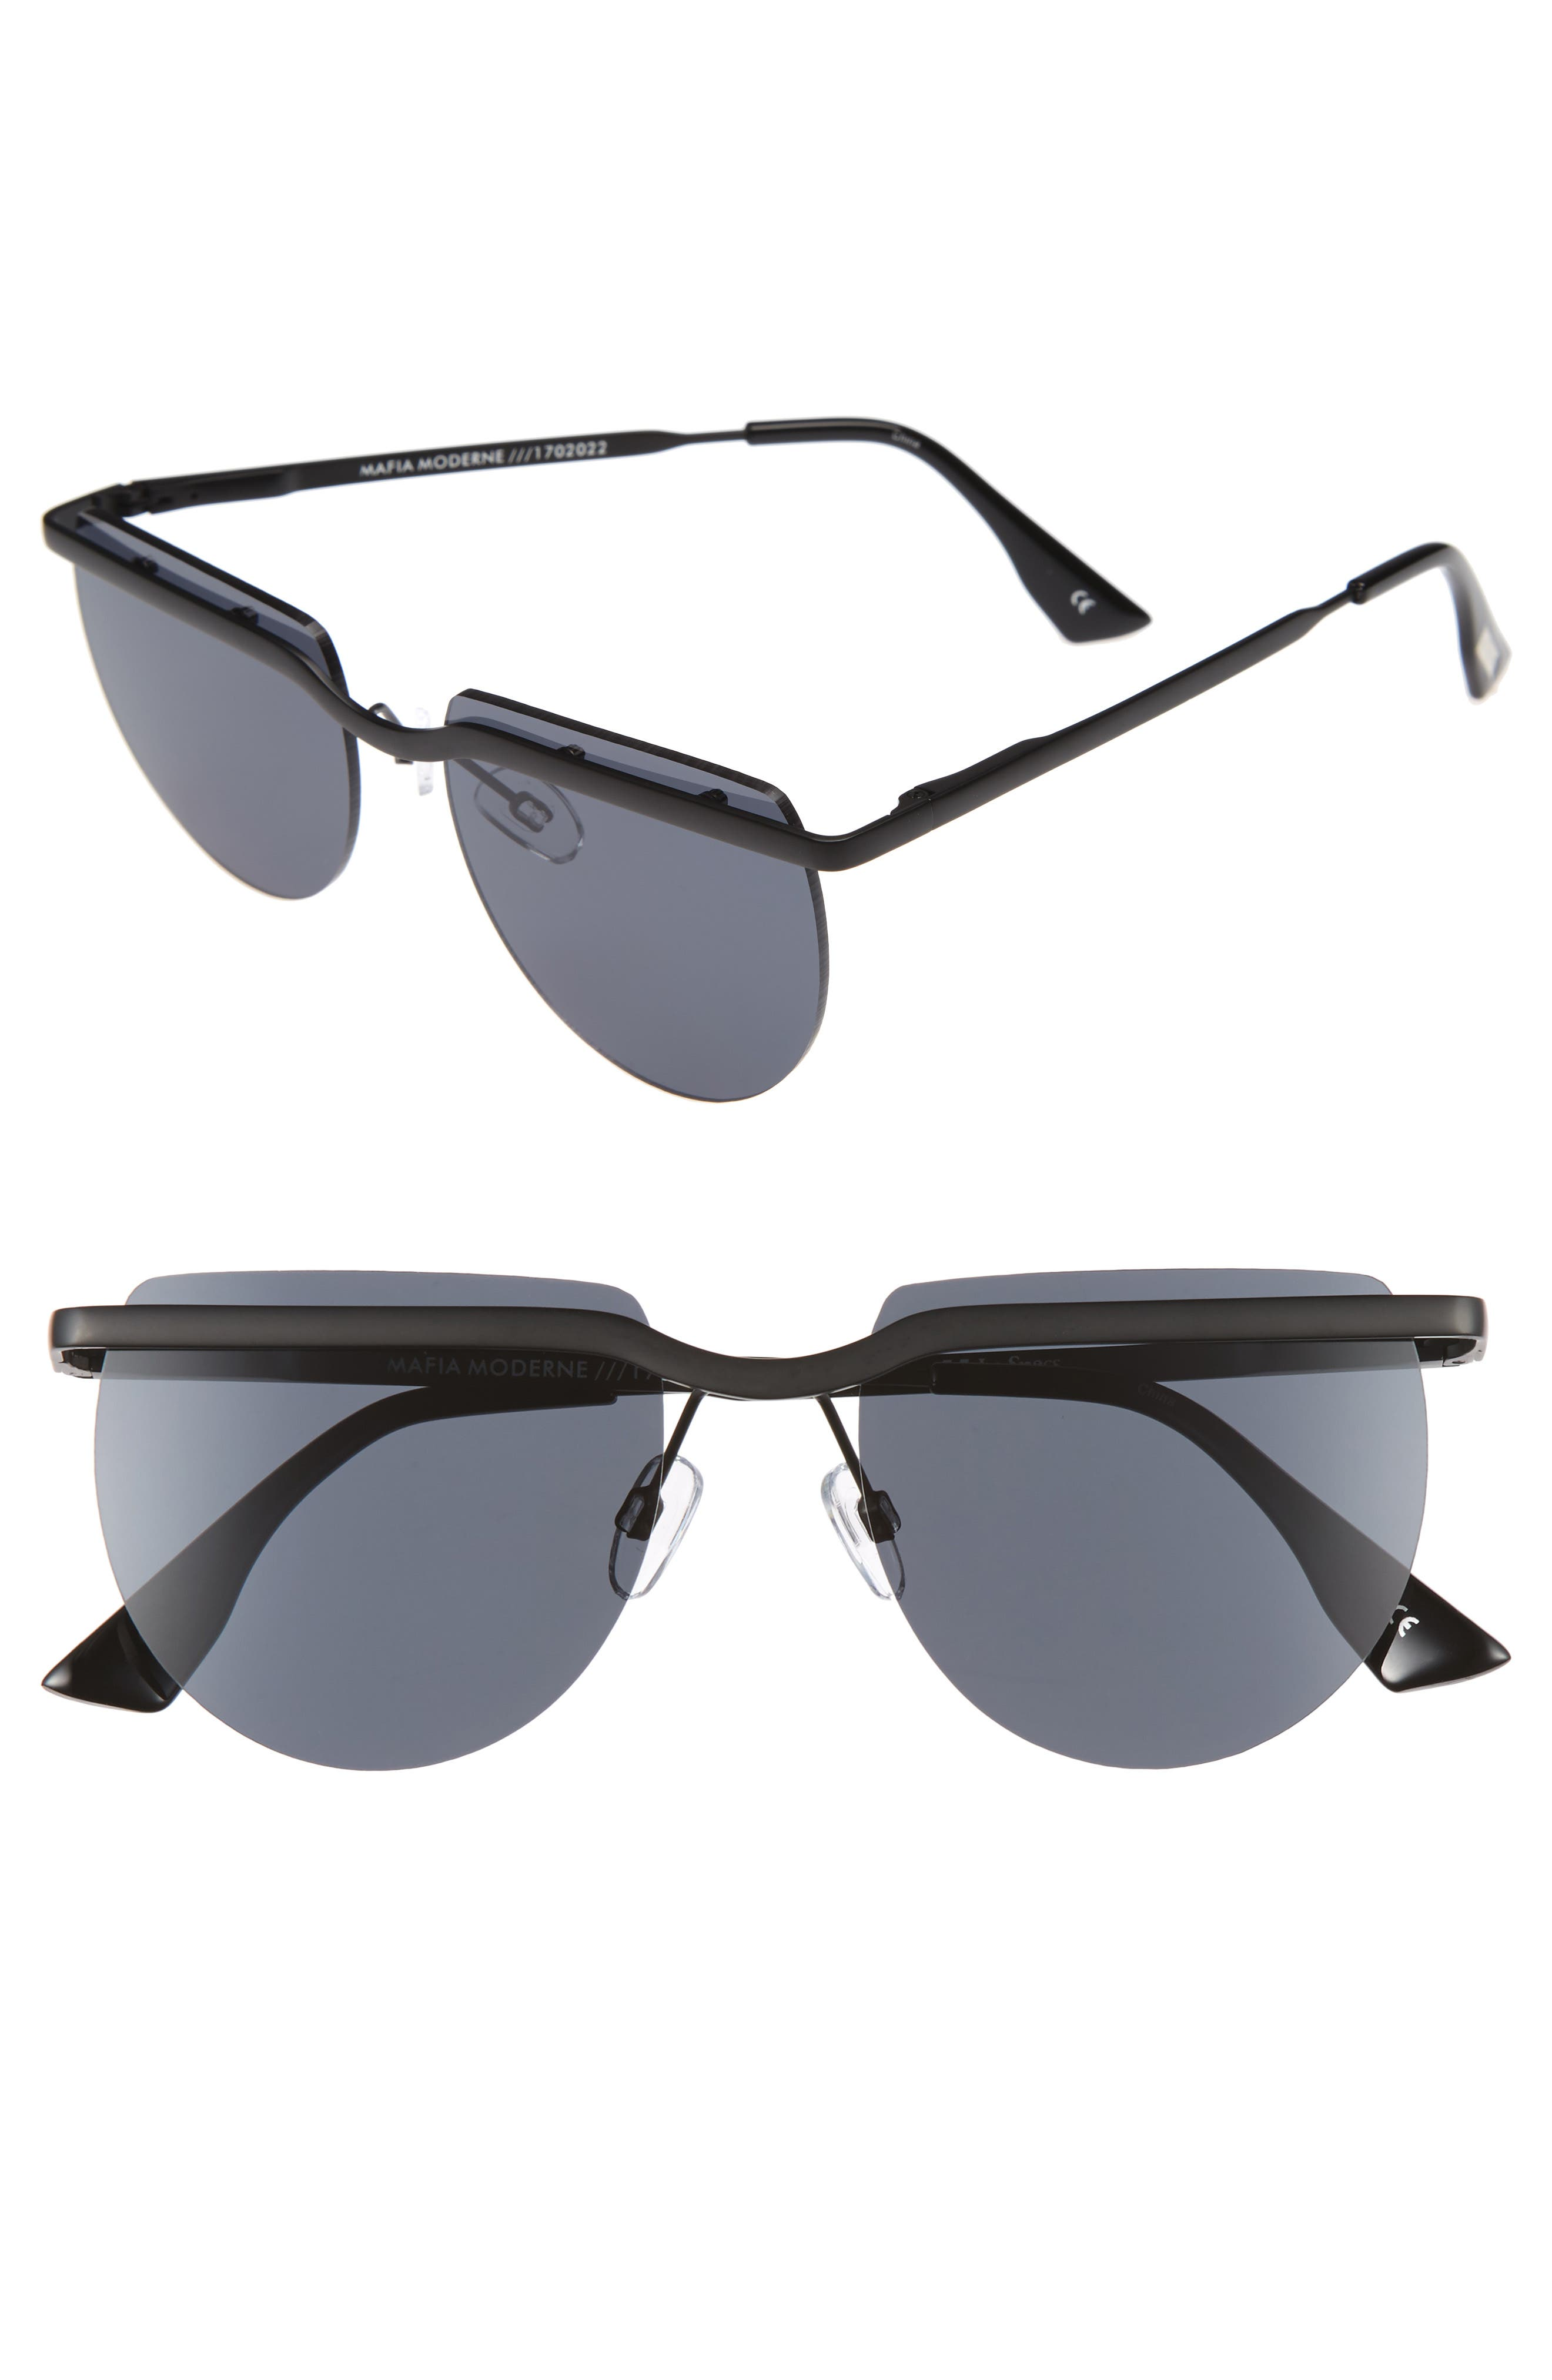 Mafia Moderne 52mm Rimless Sunglasses,                         Main,                         color, 001